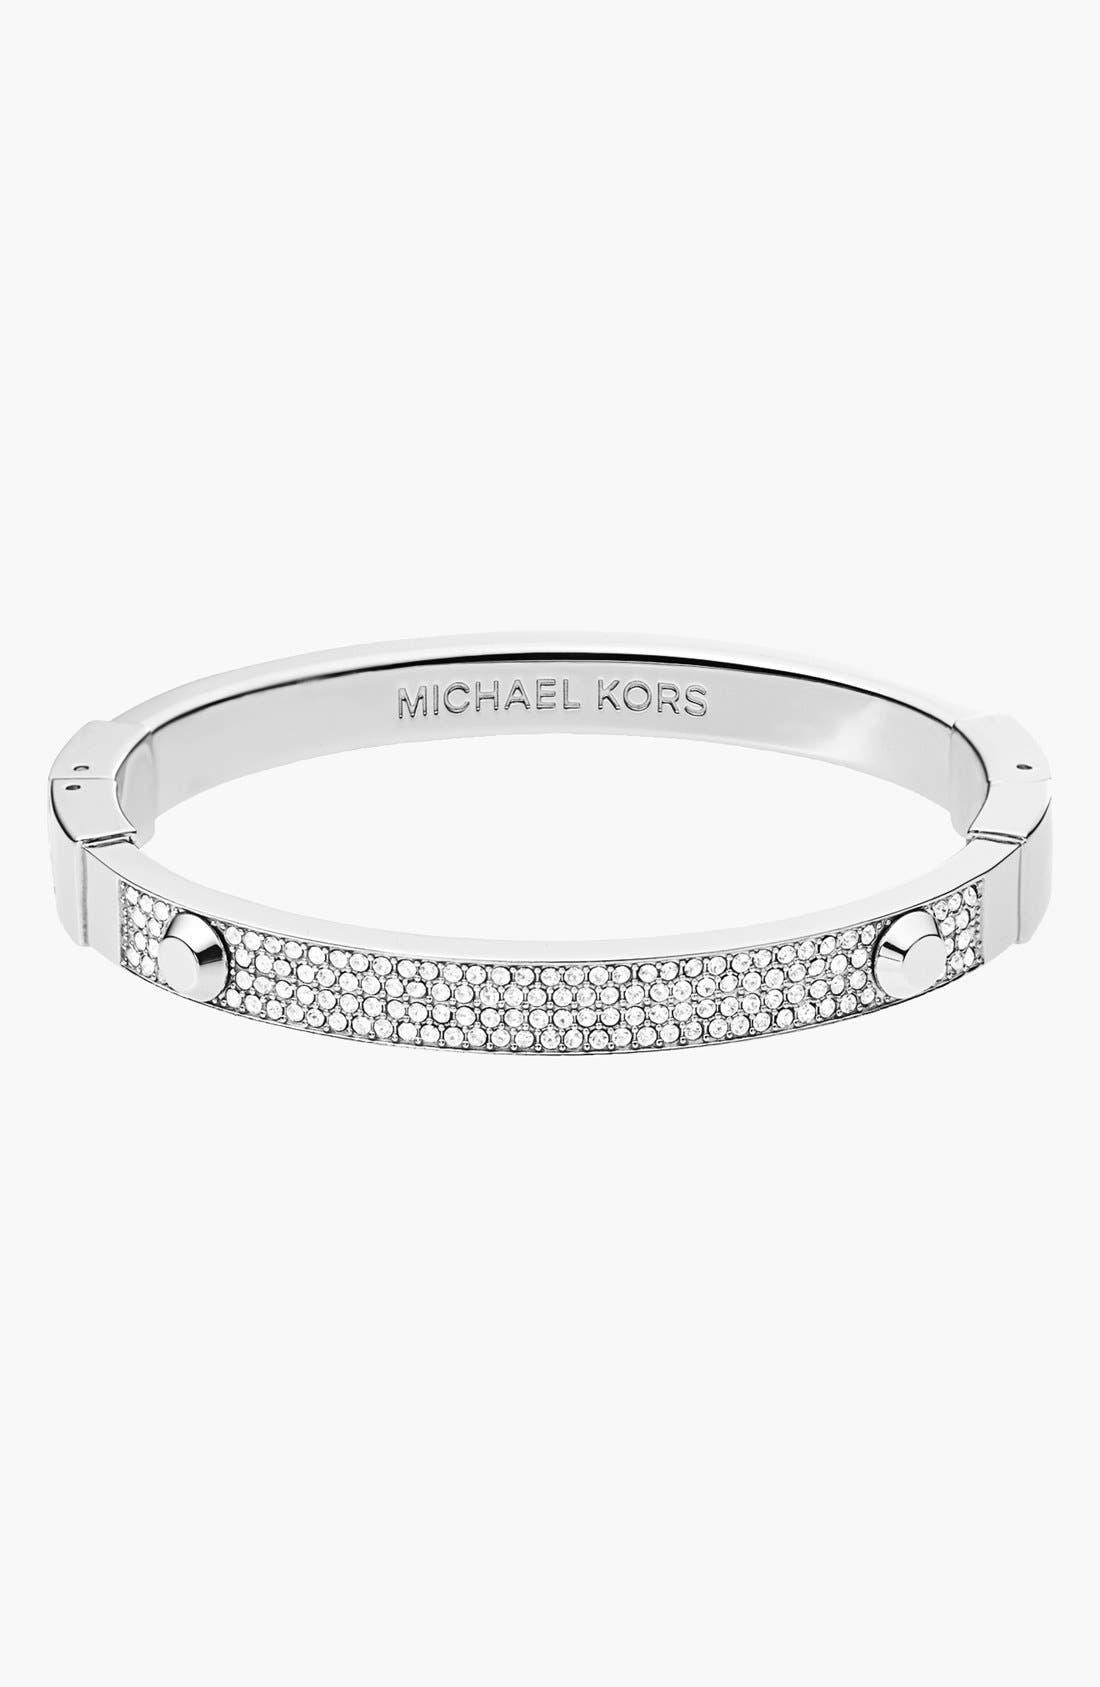 Michael Kors 'Brilliance' Hinged Bangle,                         Main,                         color, Silver/ Clear Crystal